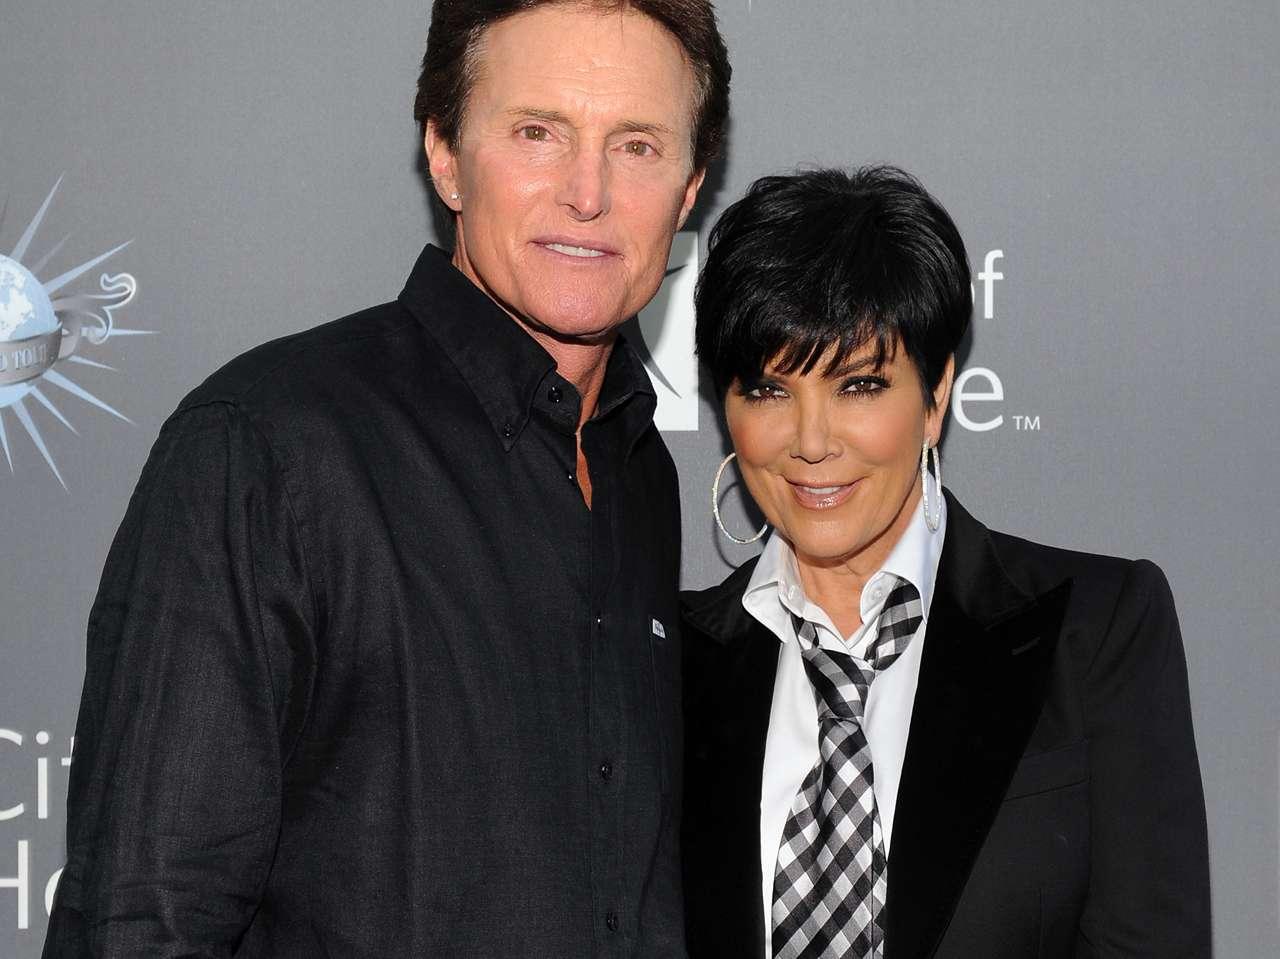 Kris y Bruce Jenner. Foto: Getty Images